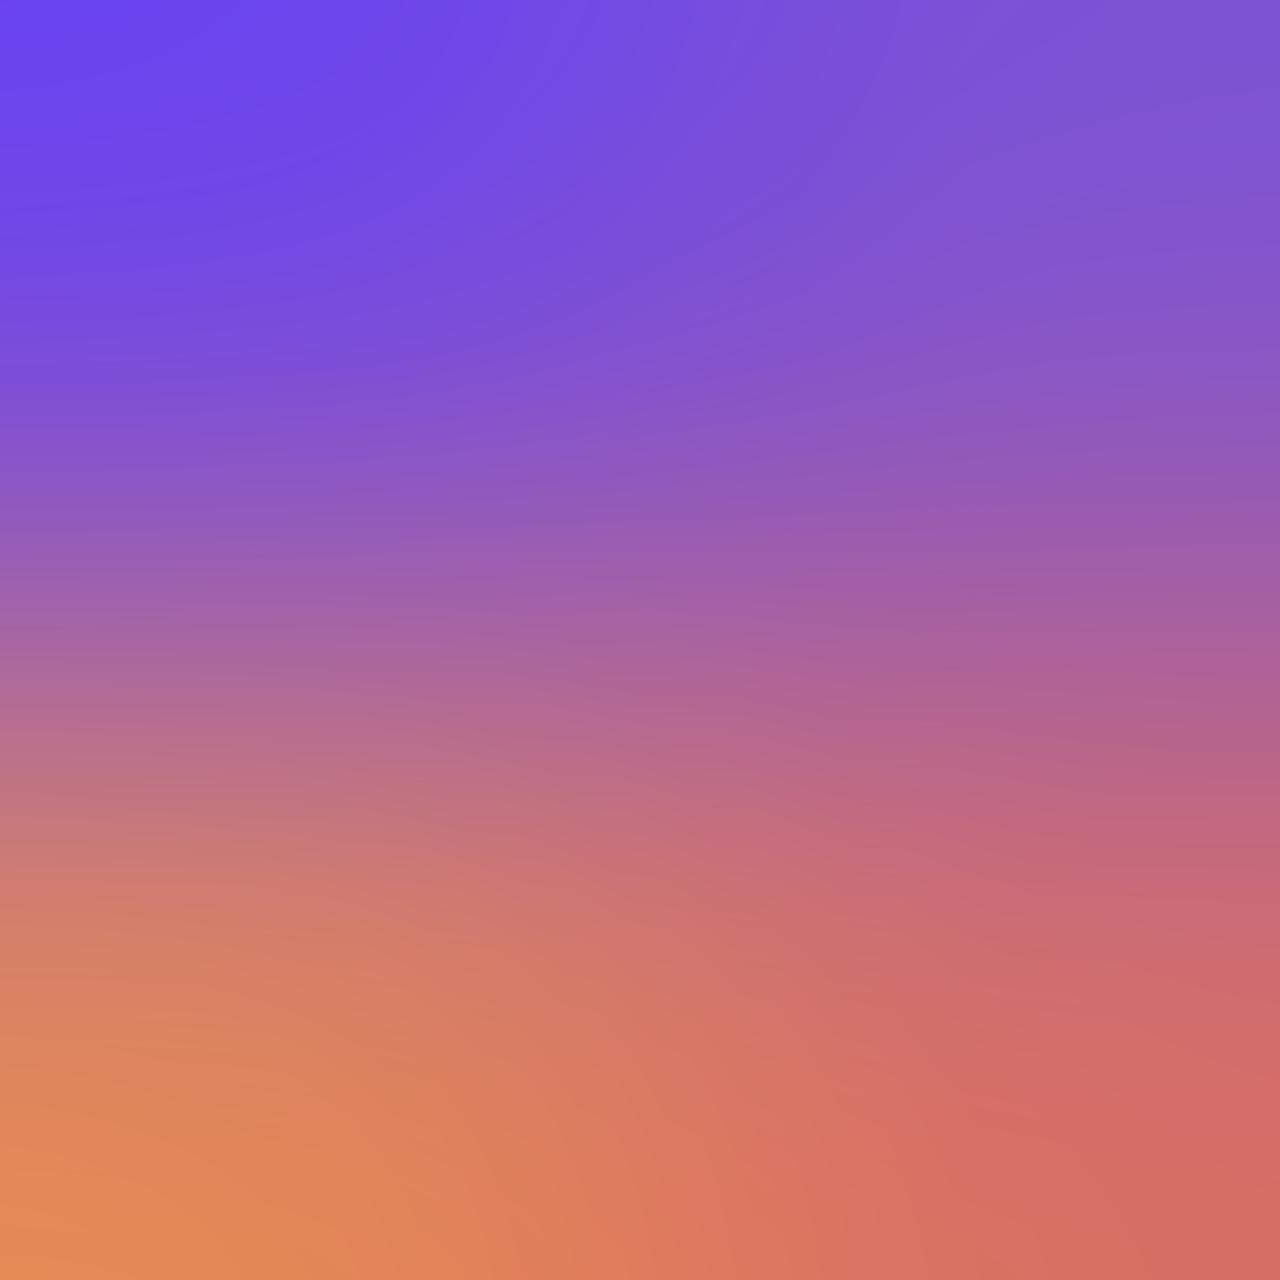 Colorful Gradient 9302 Logodesign S Izobrazheniyami Letnie Oboi